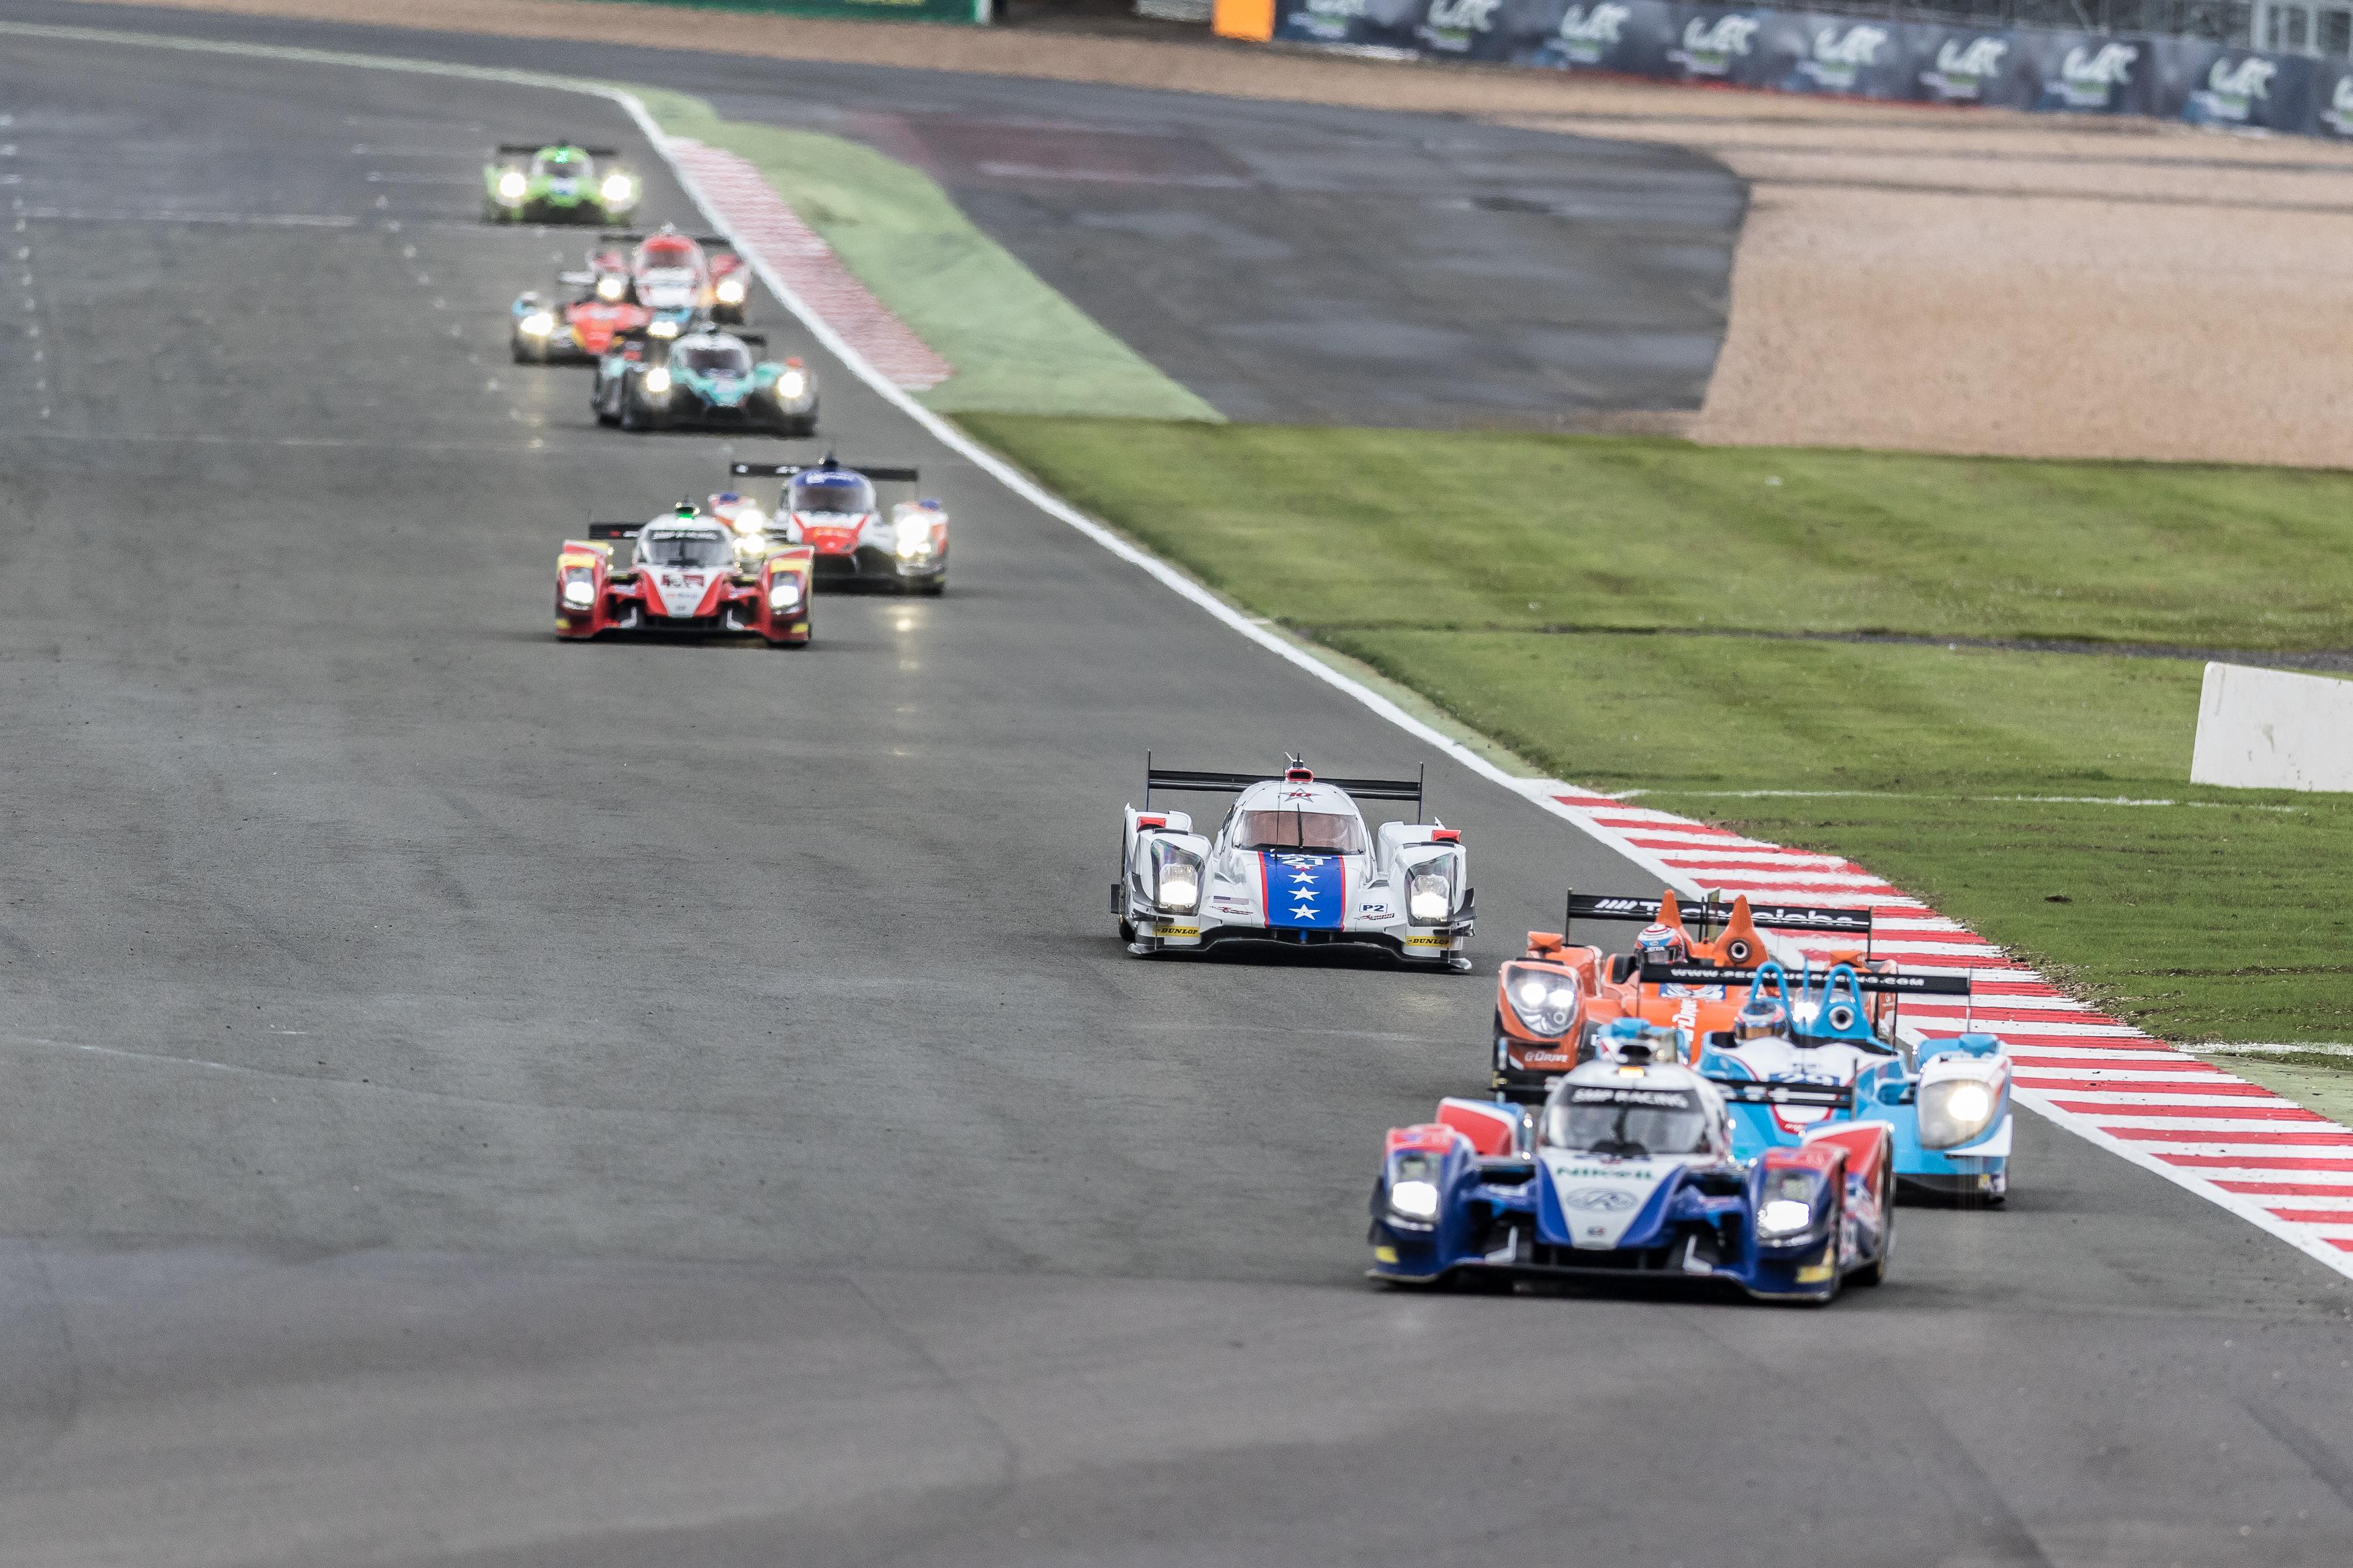 Car # 21 / DRAGONSPEED / USA / Oreca 05 - Nissan / Henrik Hedman (SWE) / Nicolas Lapierre ( FRA) / Ben Hanley (GBR) - ELMS 4 Hours of Silverstone  - Silverstone Circuit - Towcester, Northamptonshire - UK